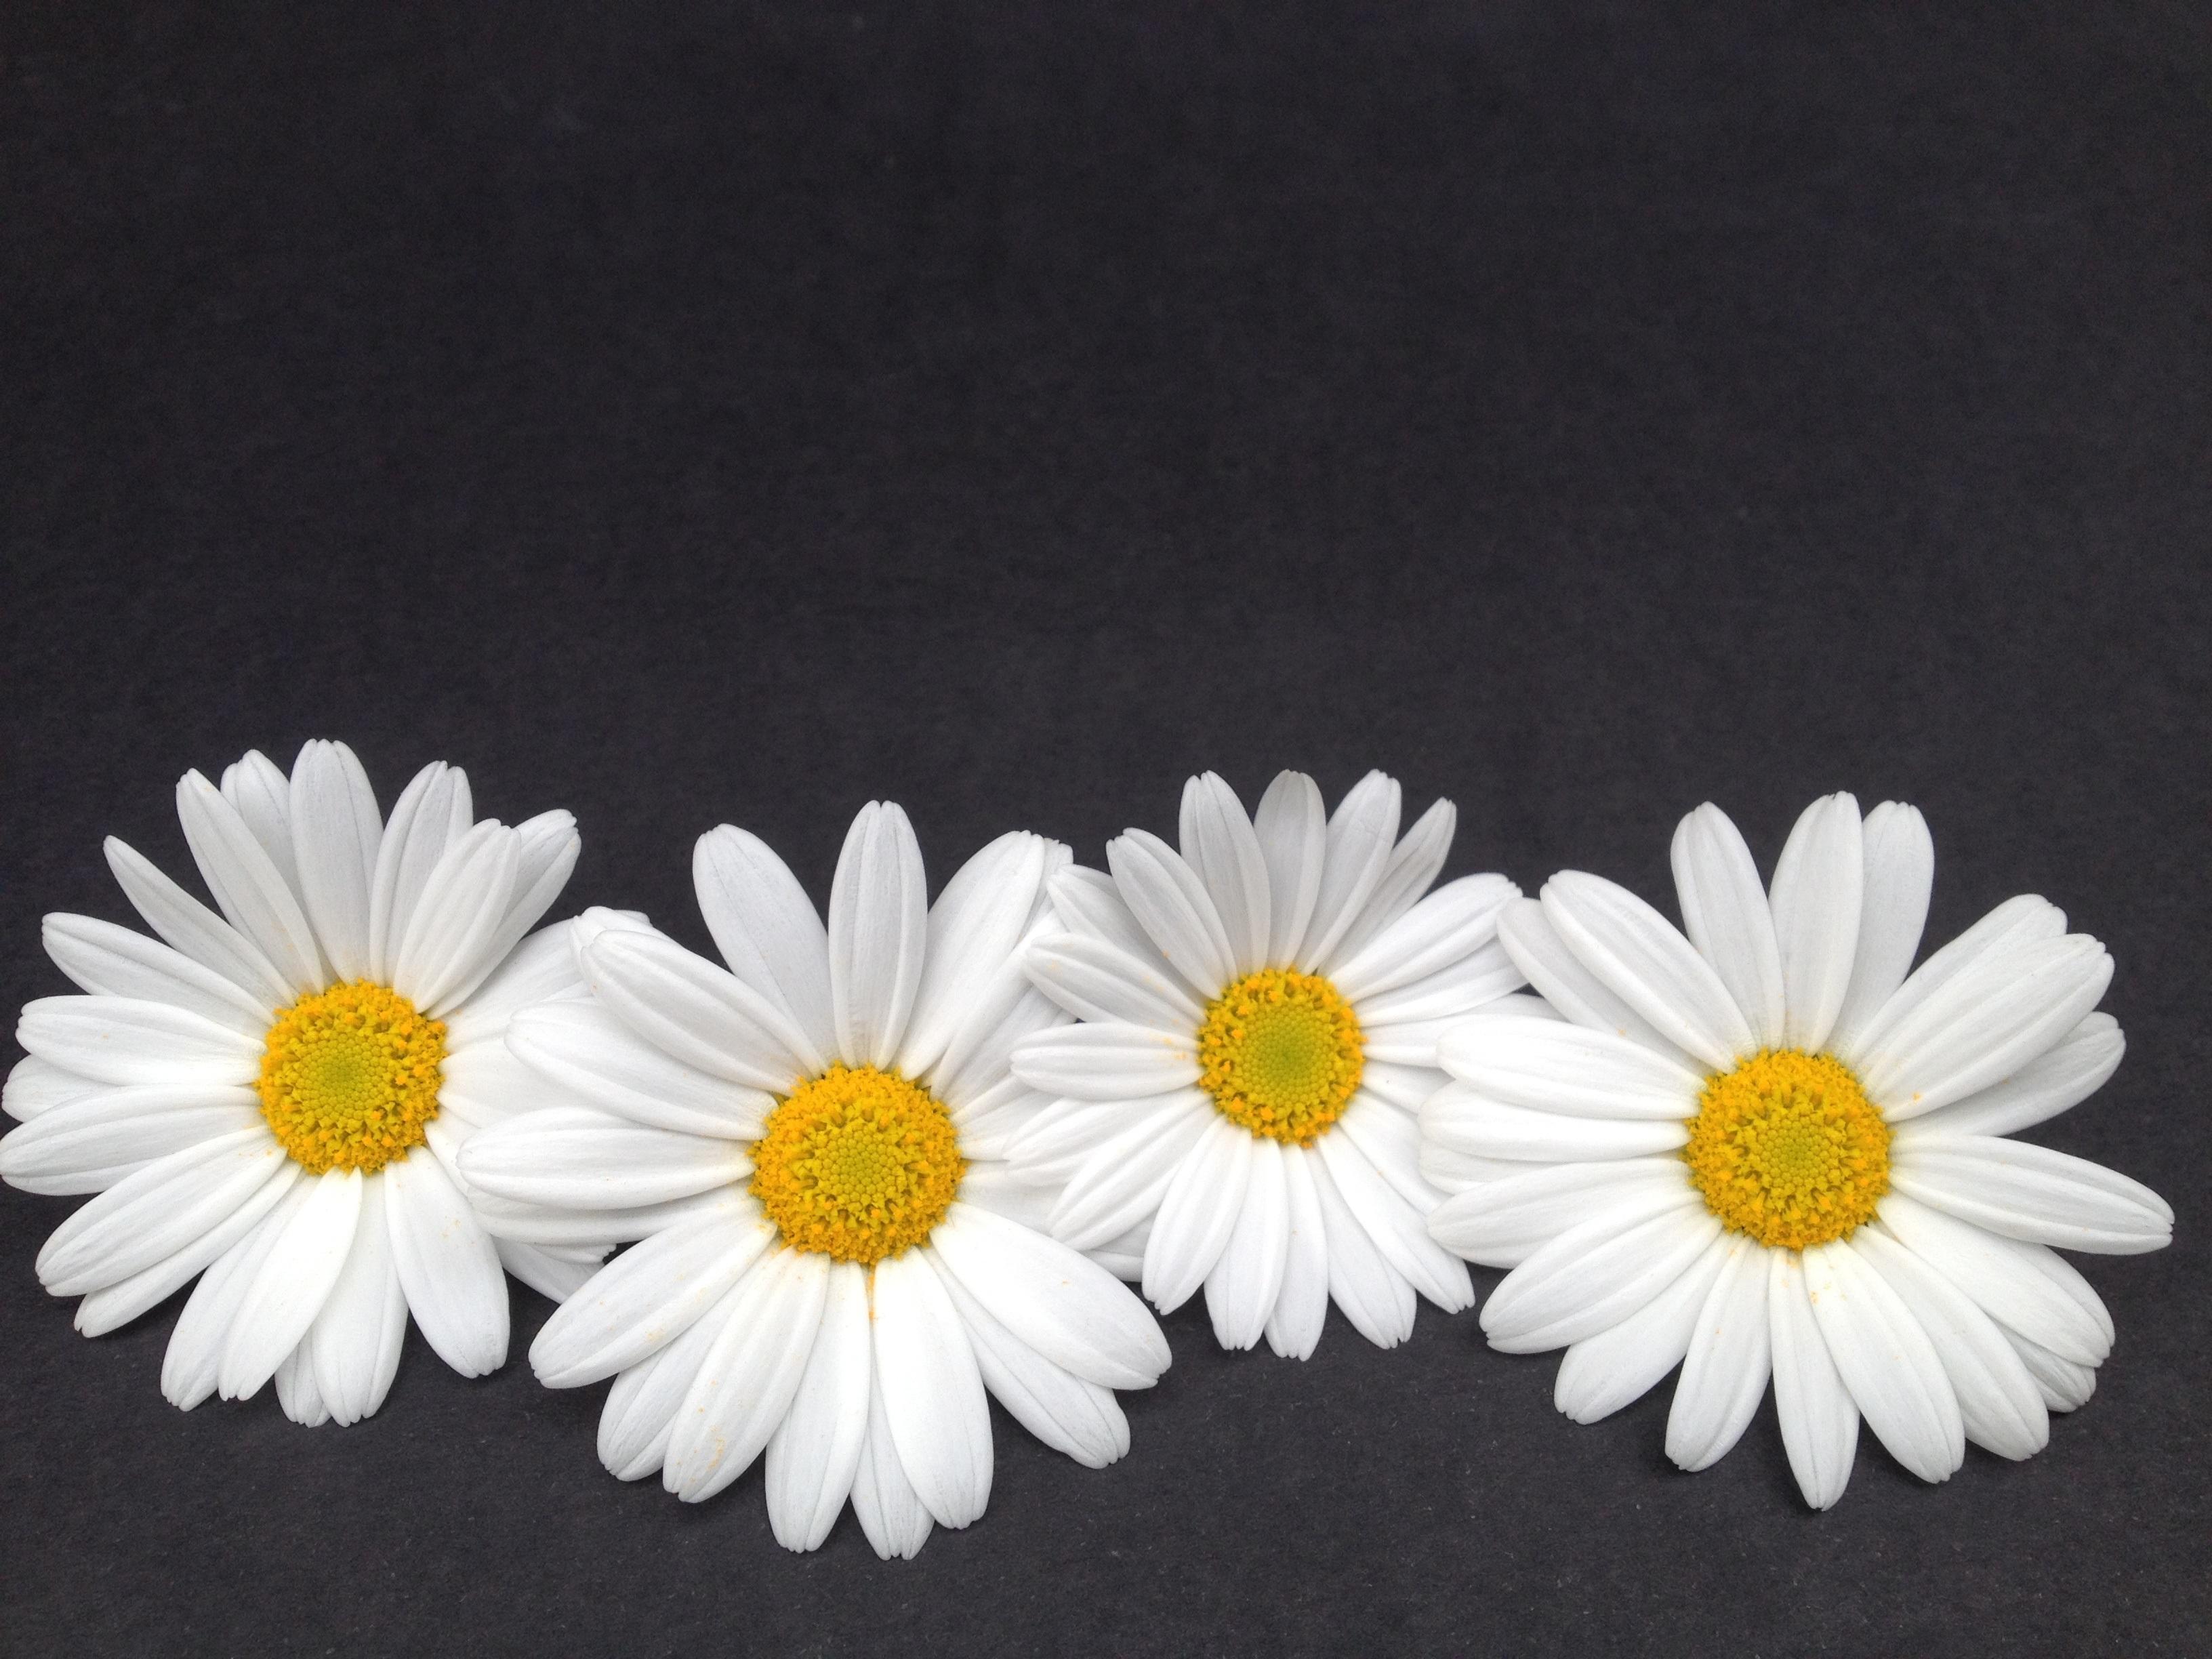 Fotos gratis : blanco, flor, pétalo, decoración, ornamento, art ...